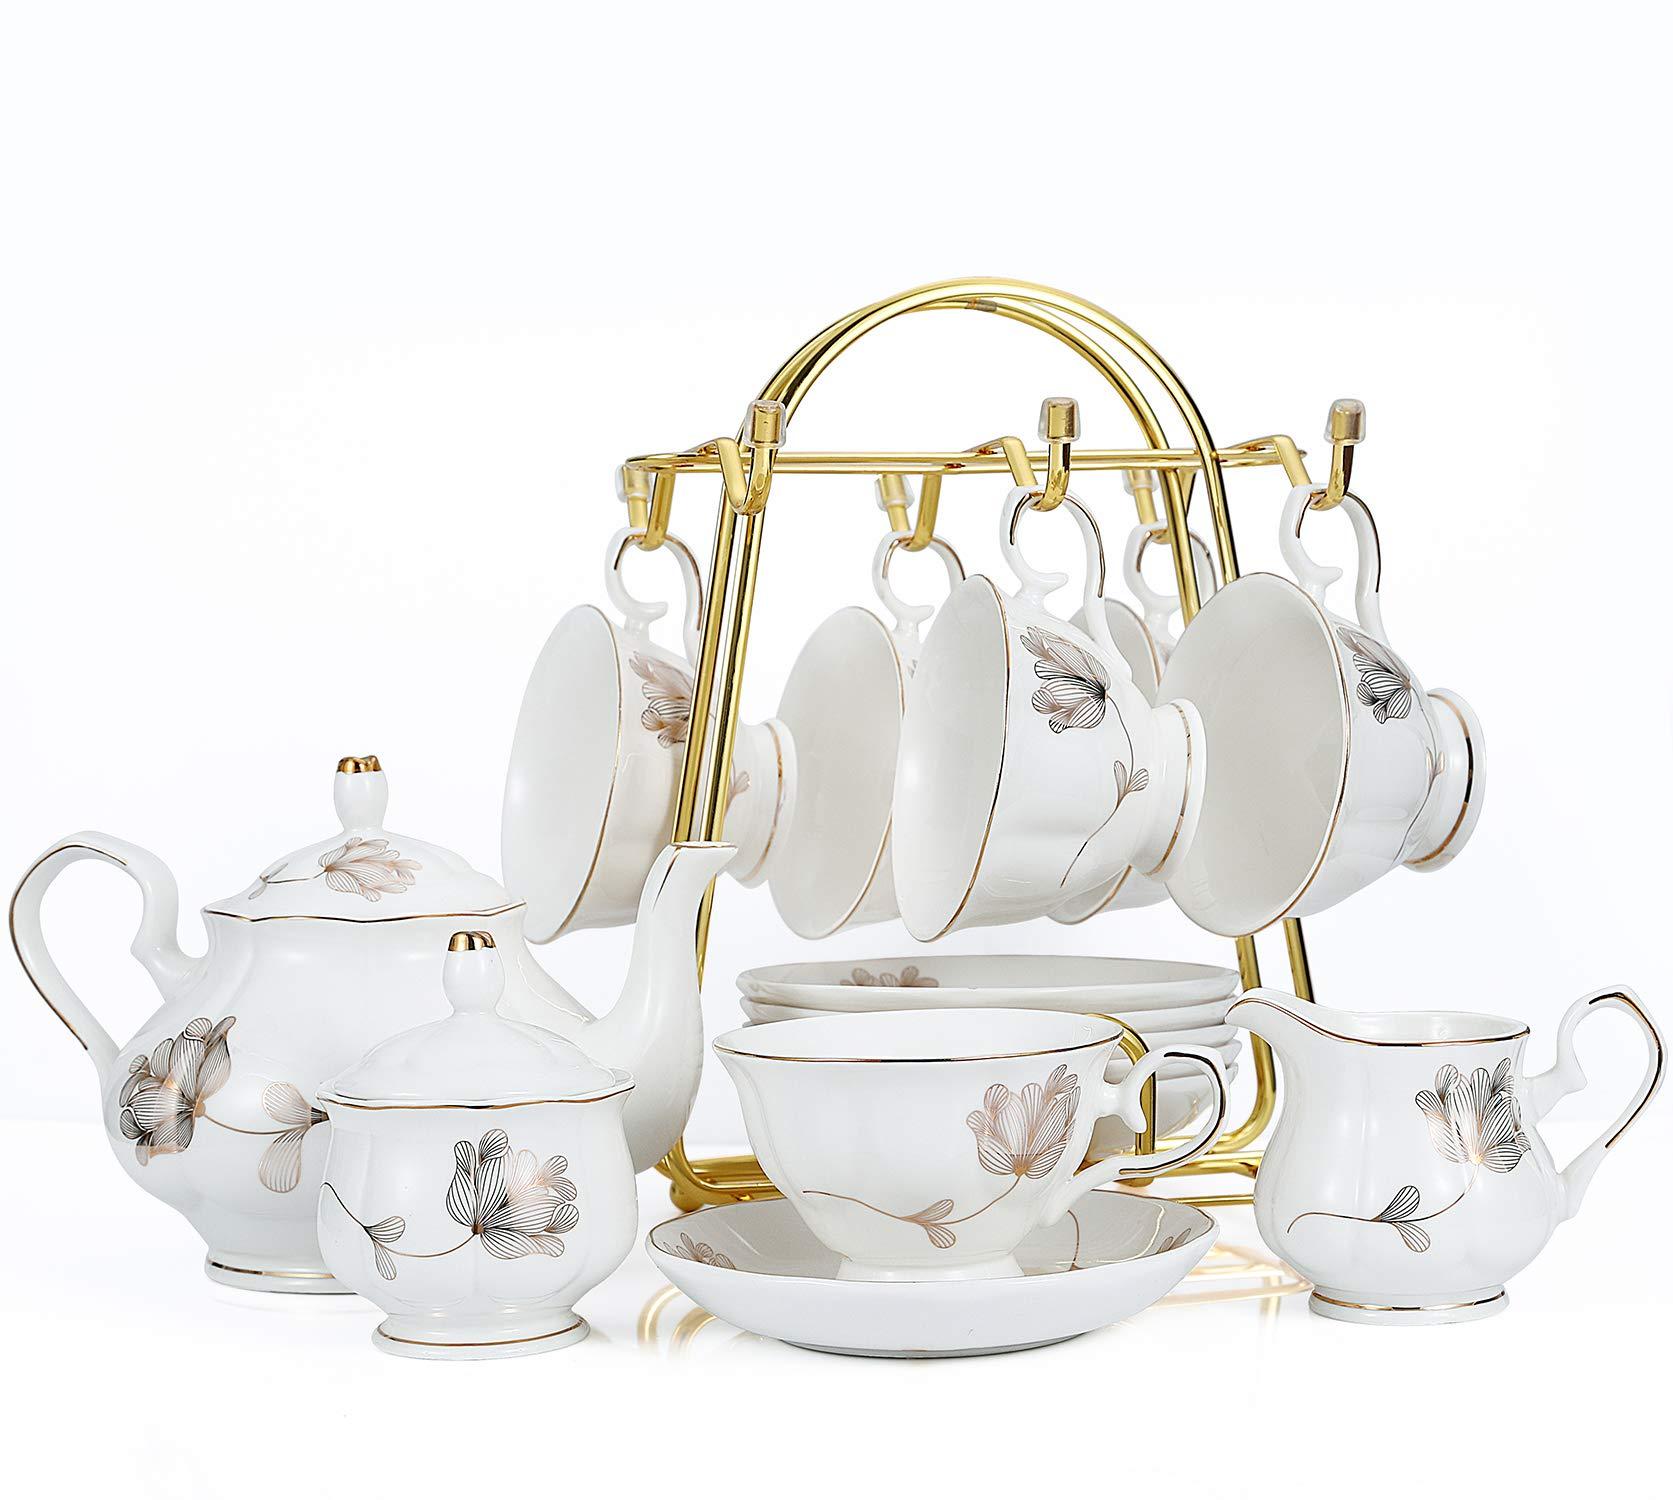 15-Piece Porcelain Ceramic Tea Gift Sets, Cups& Saucer Service for 6, Teapot, Sugar Bowl and Creamer Pitcher